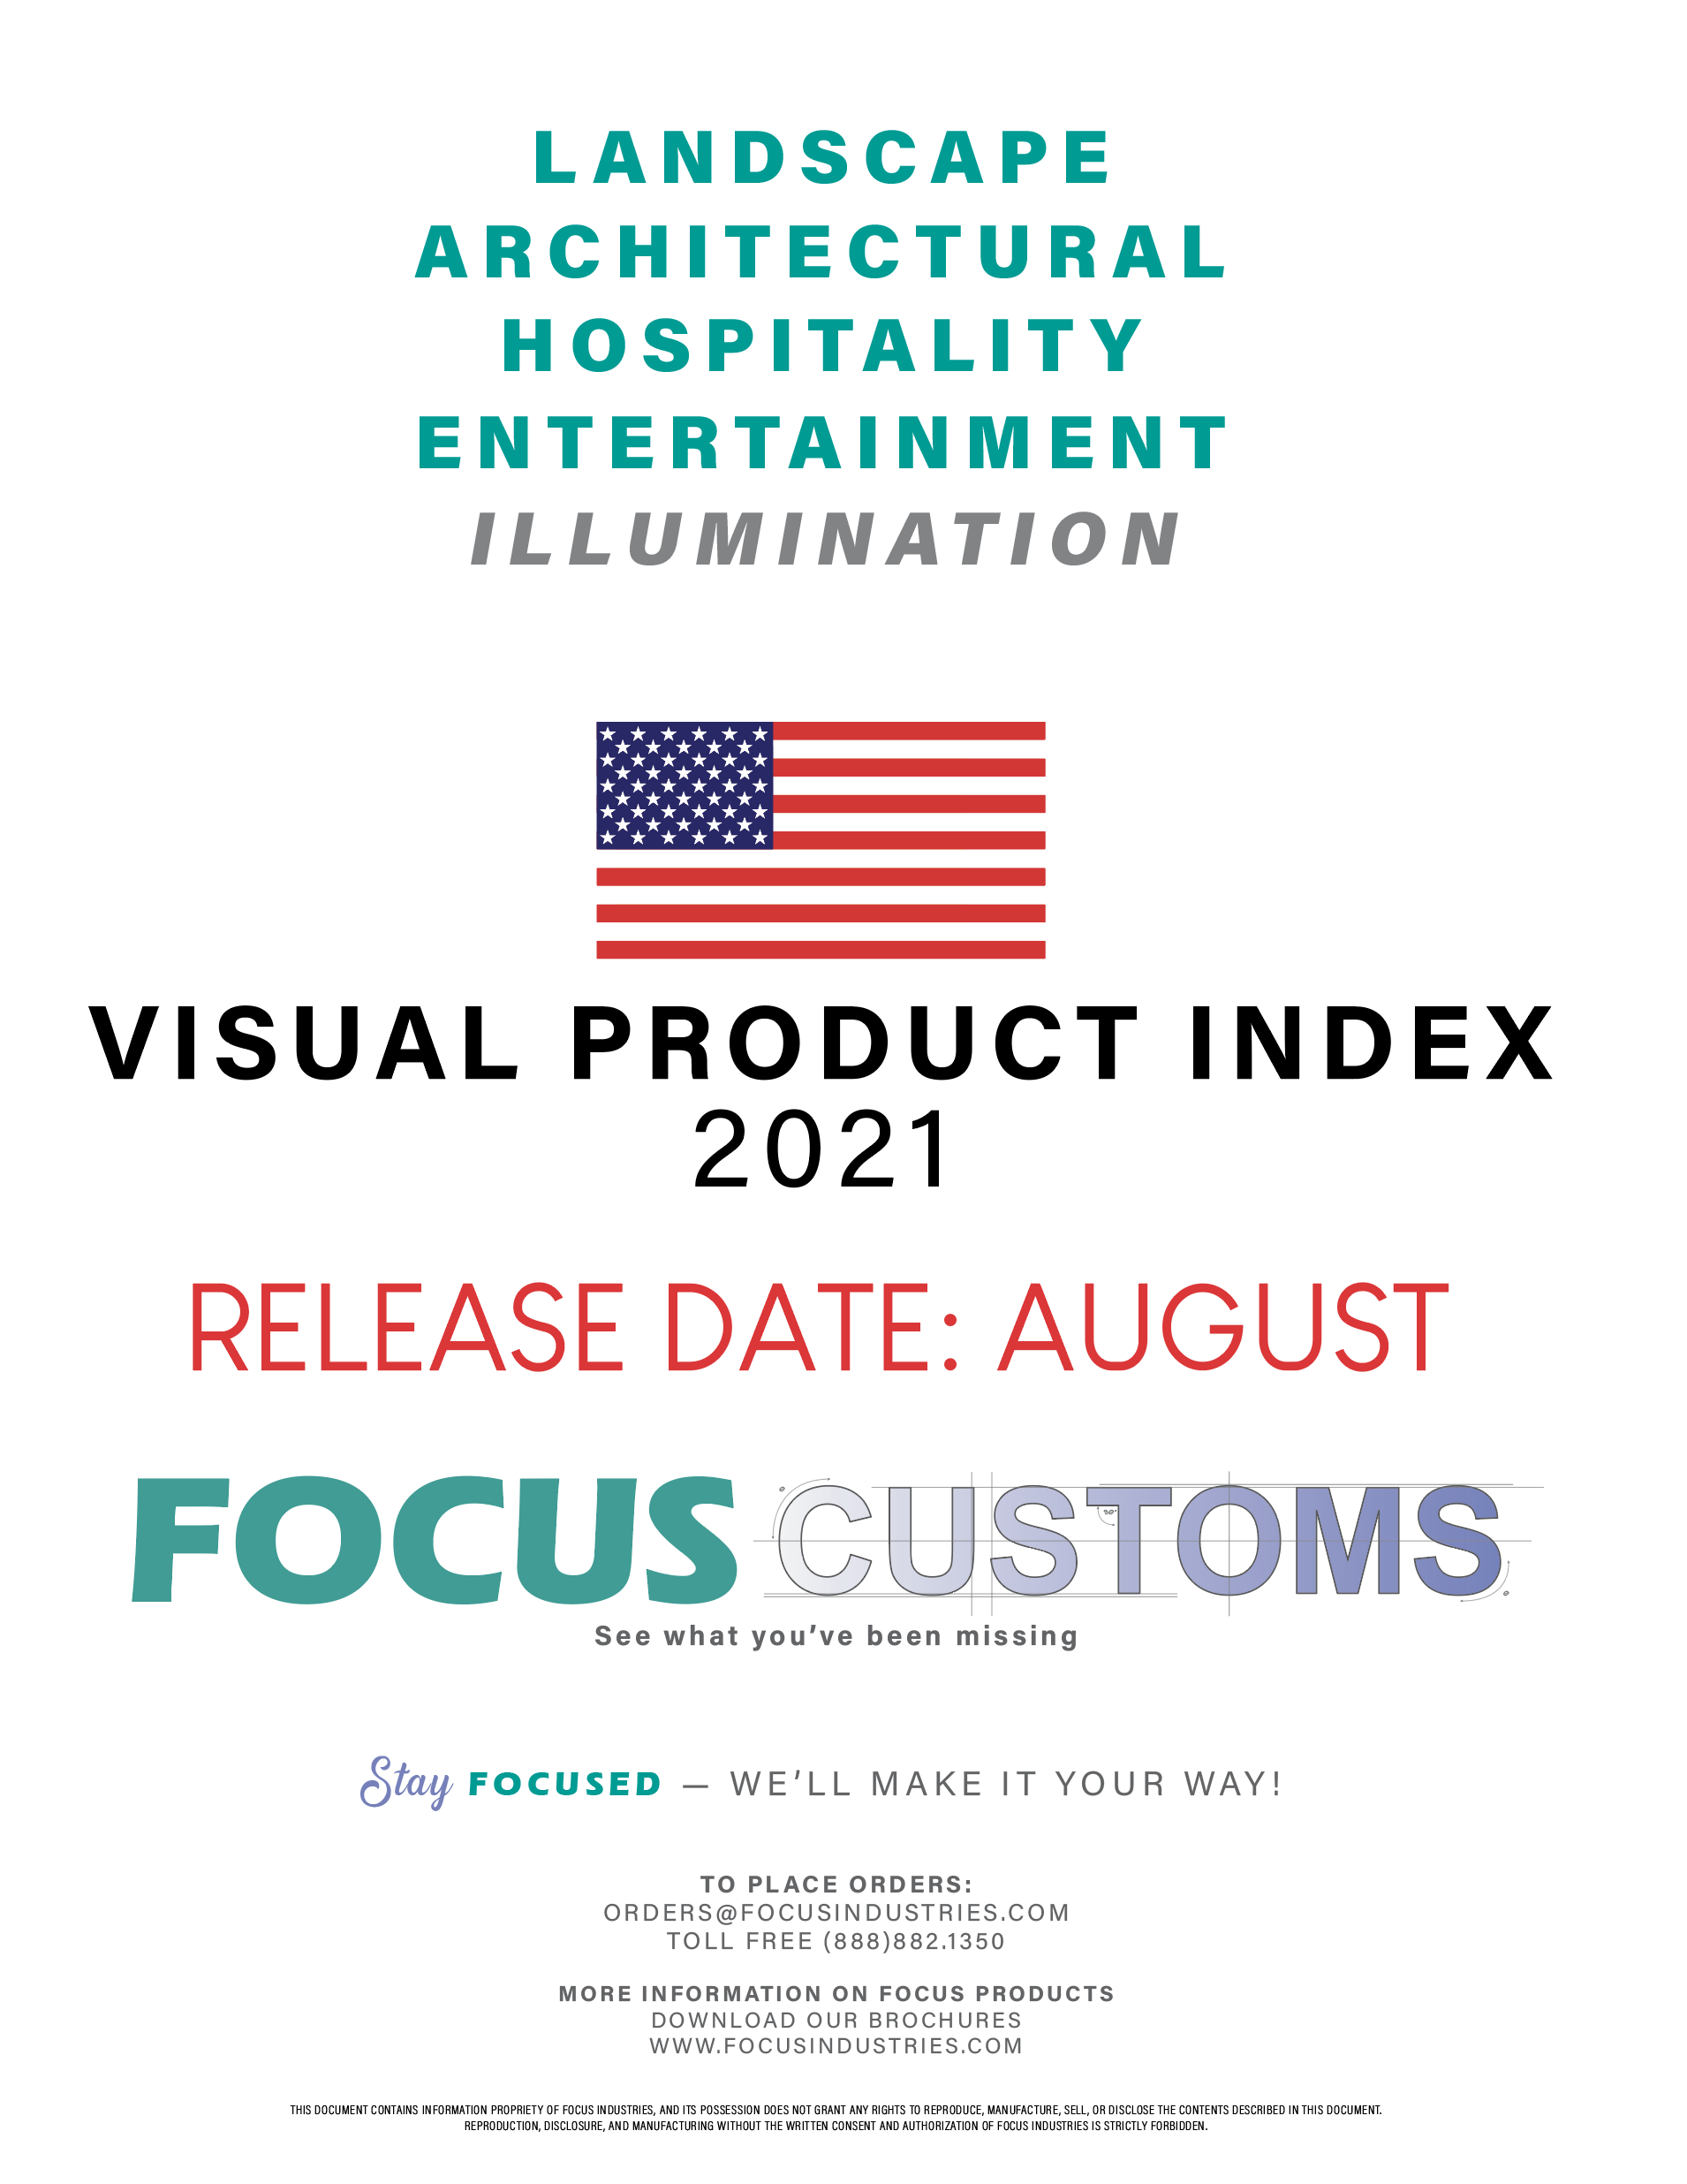 VPI 2021 August Release